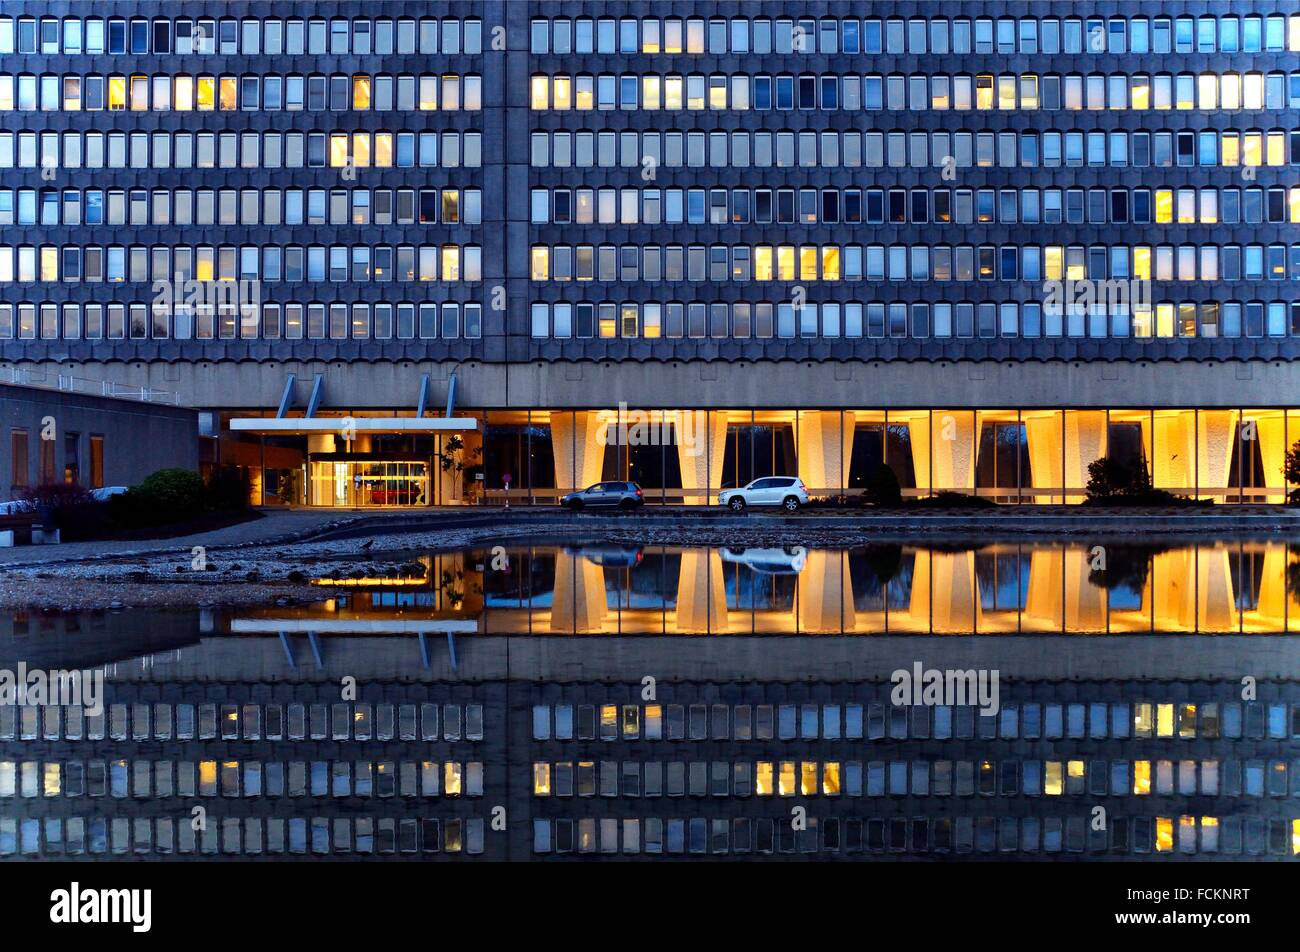 main entrance to ILO - International Labor Office - headquarters in Geneva, United Nations , U.N. Switzerland. - Stock Image